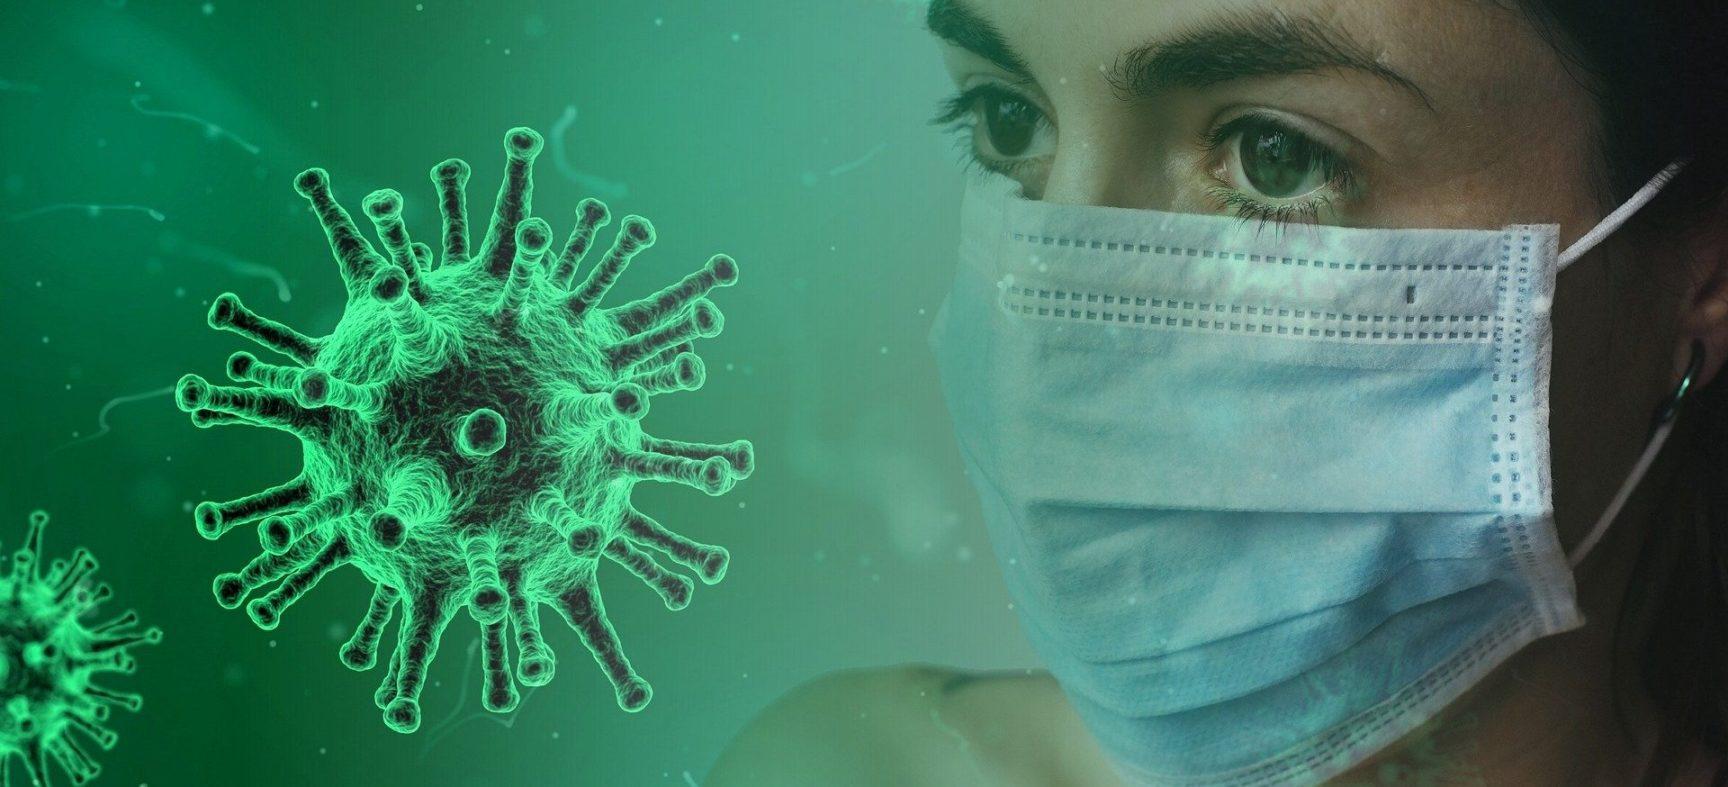 Patienteninformation zum CORONA-Virus